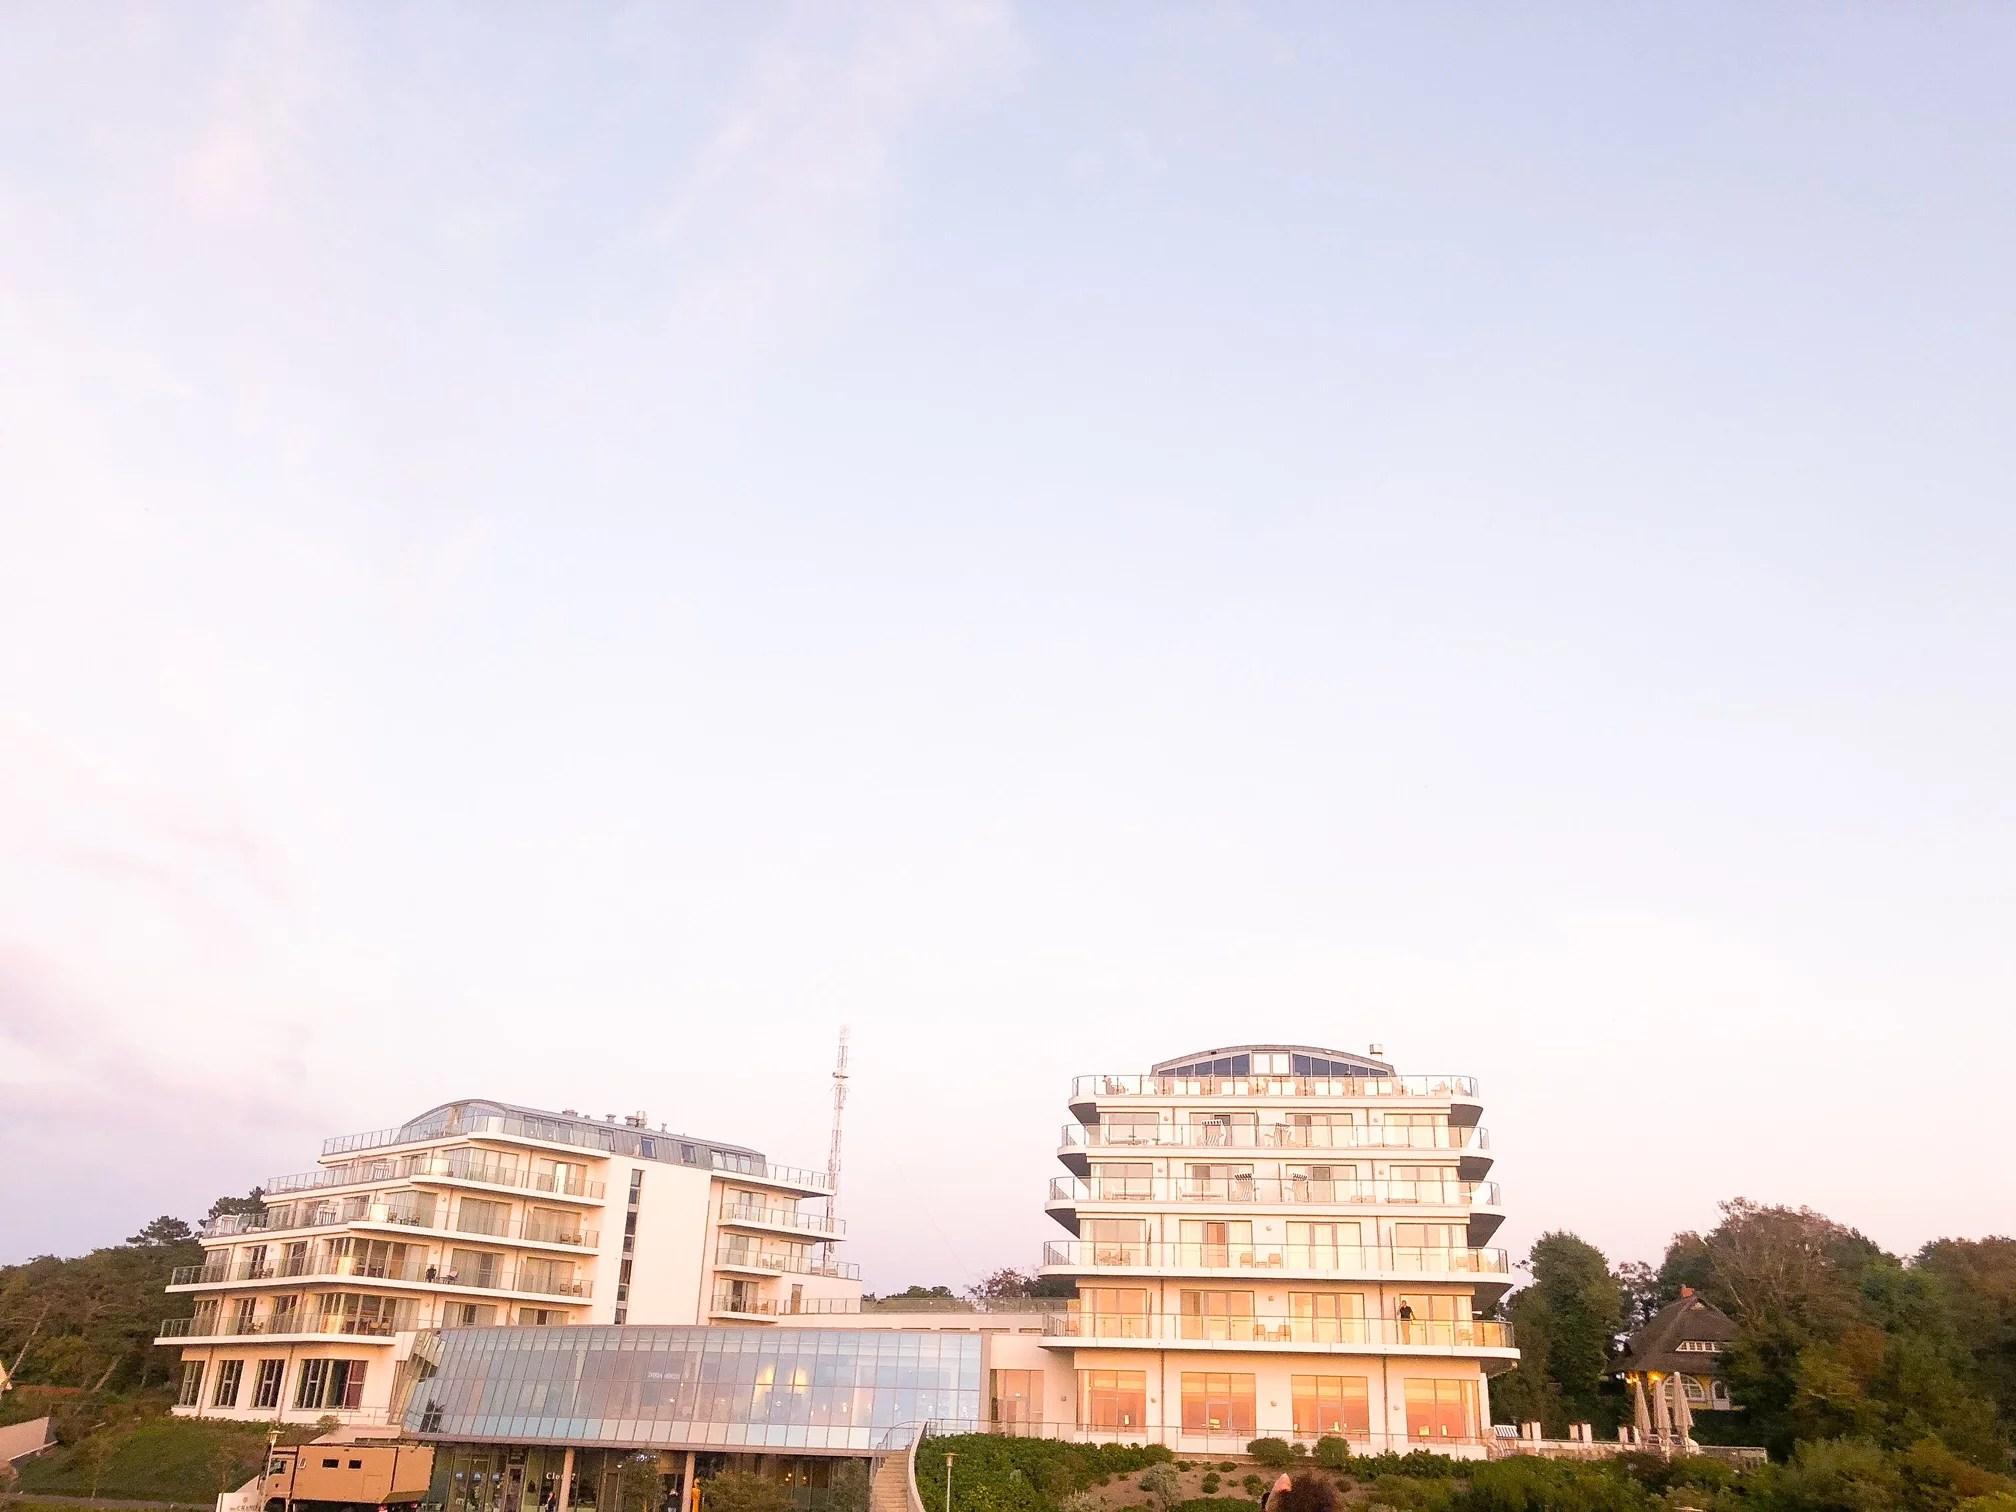 Hotel The Grand Ahrenshoop